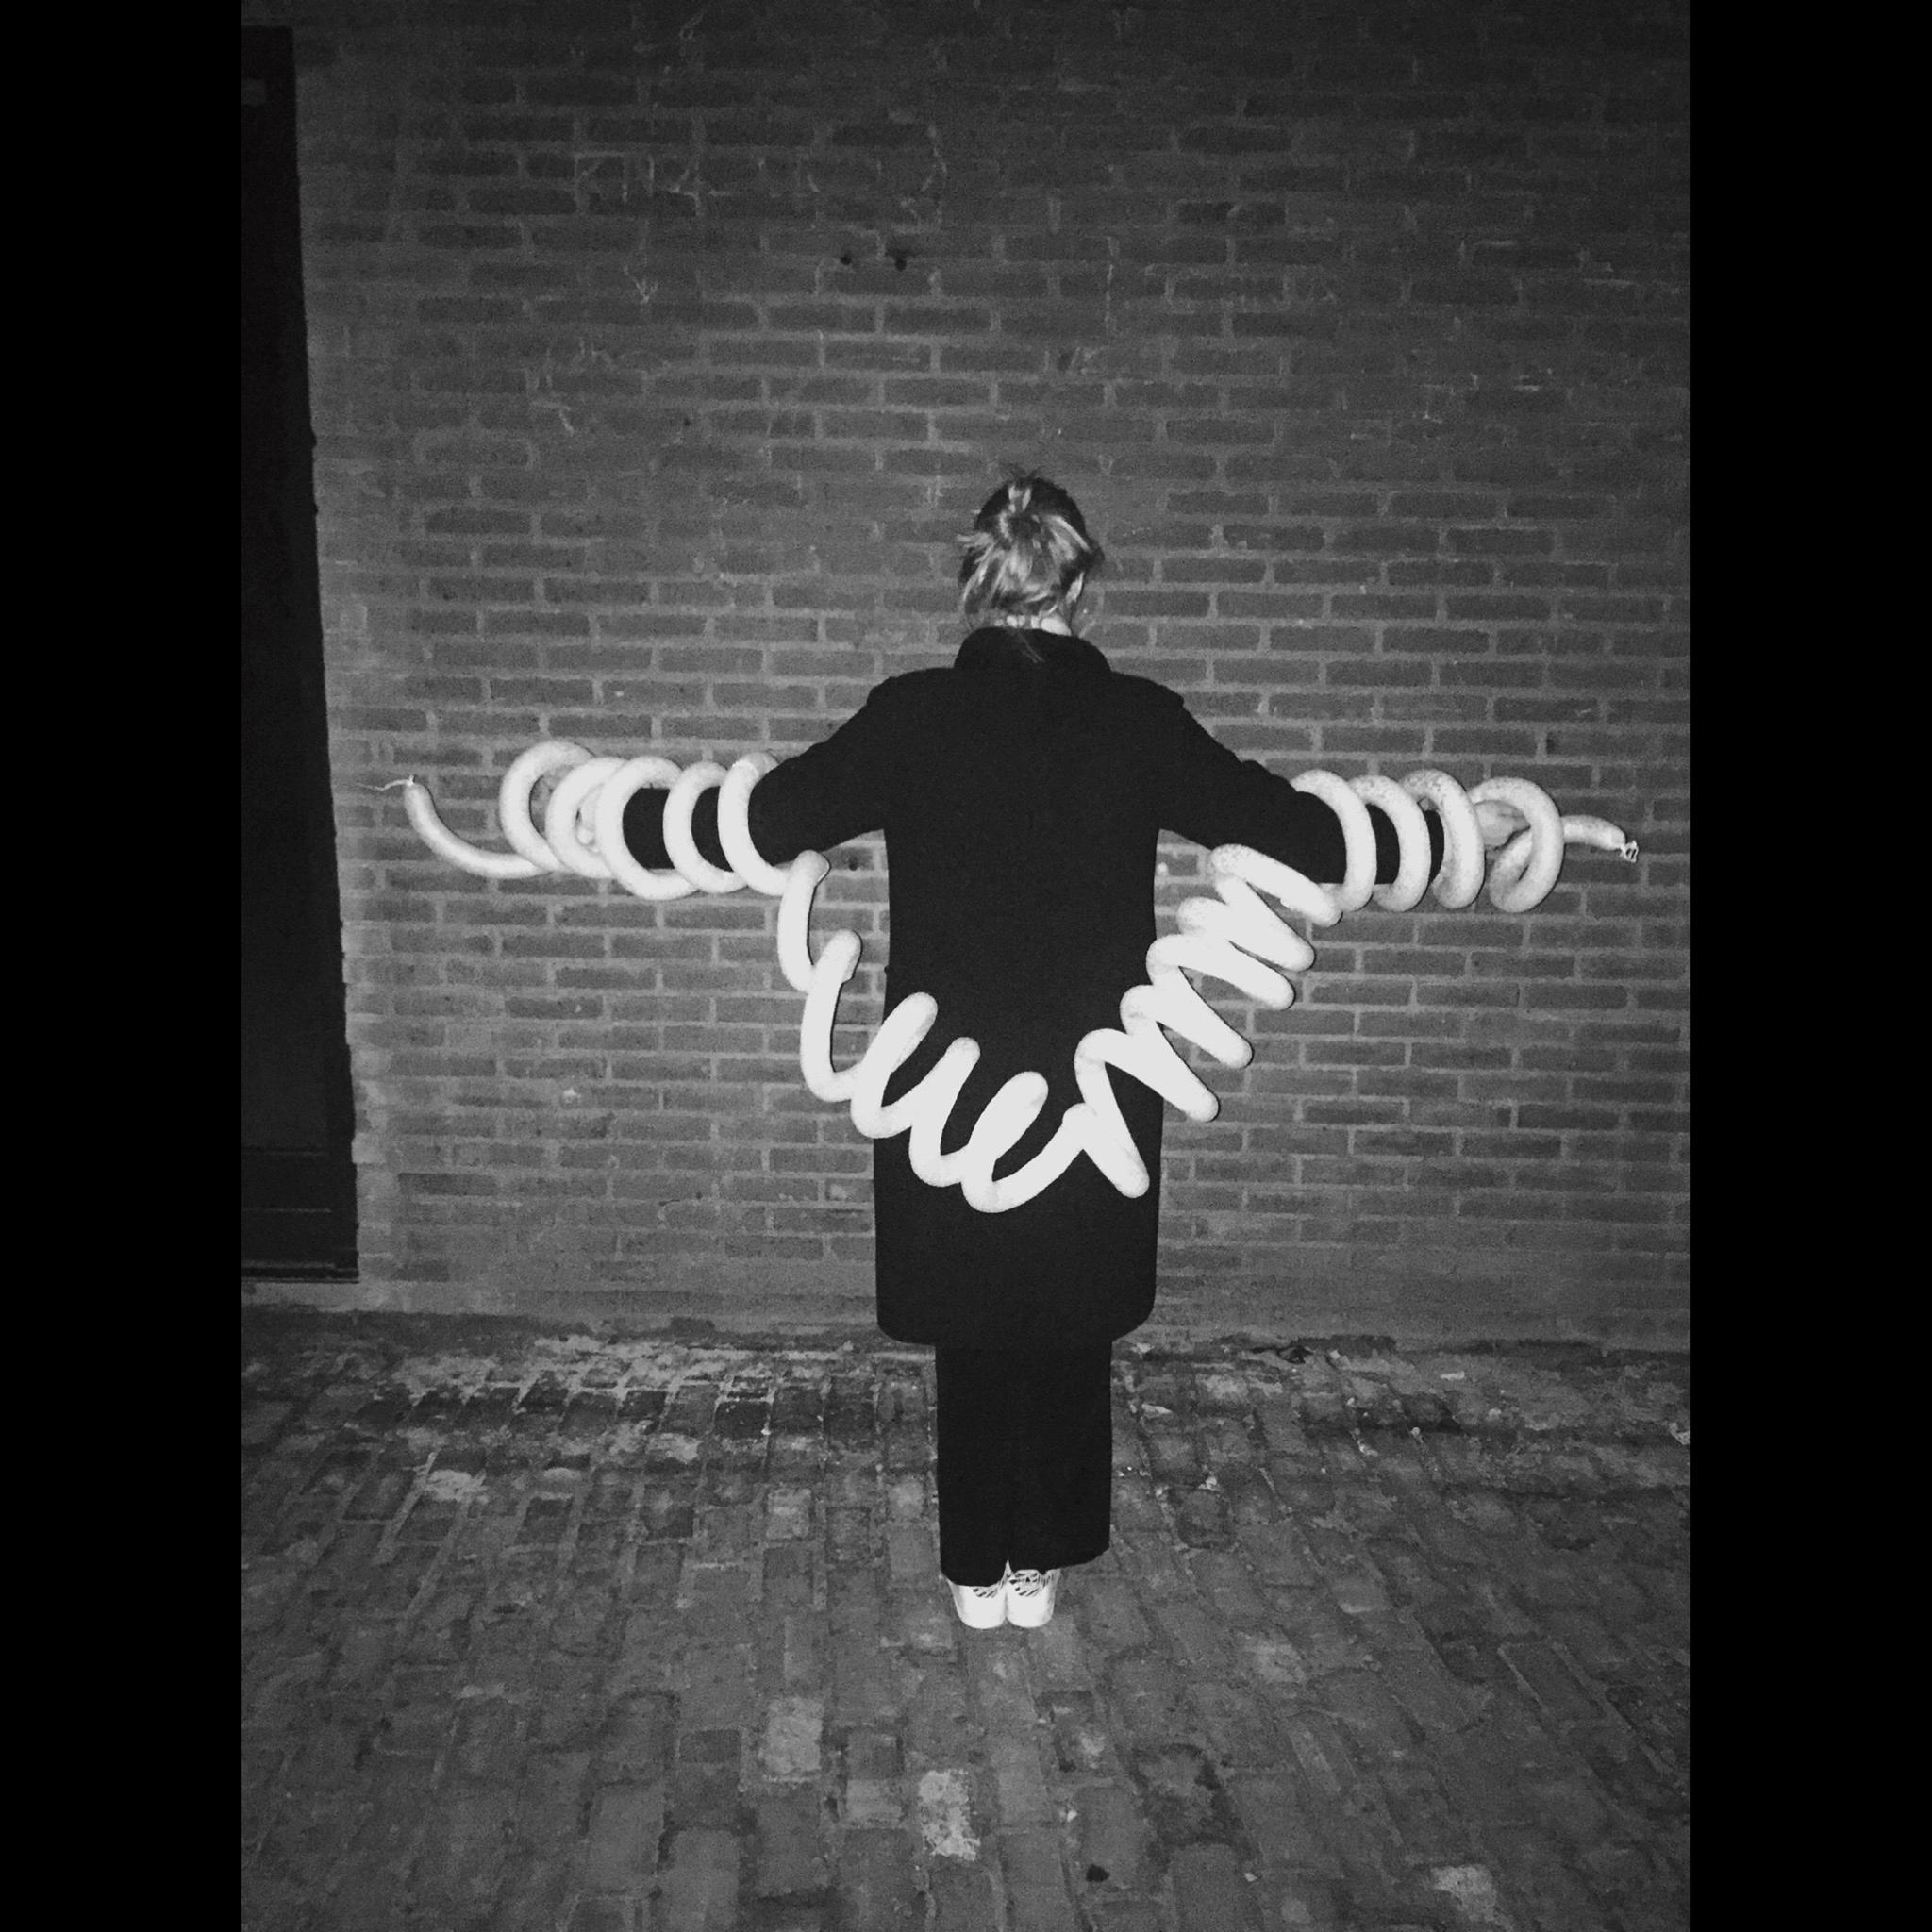 07_studiokbb_insideout_lowres.jpg